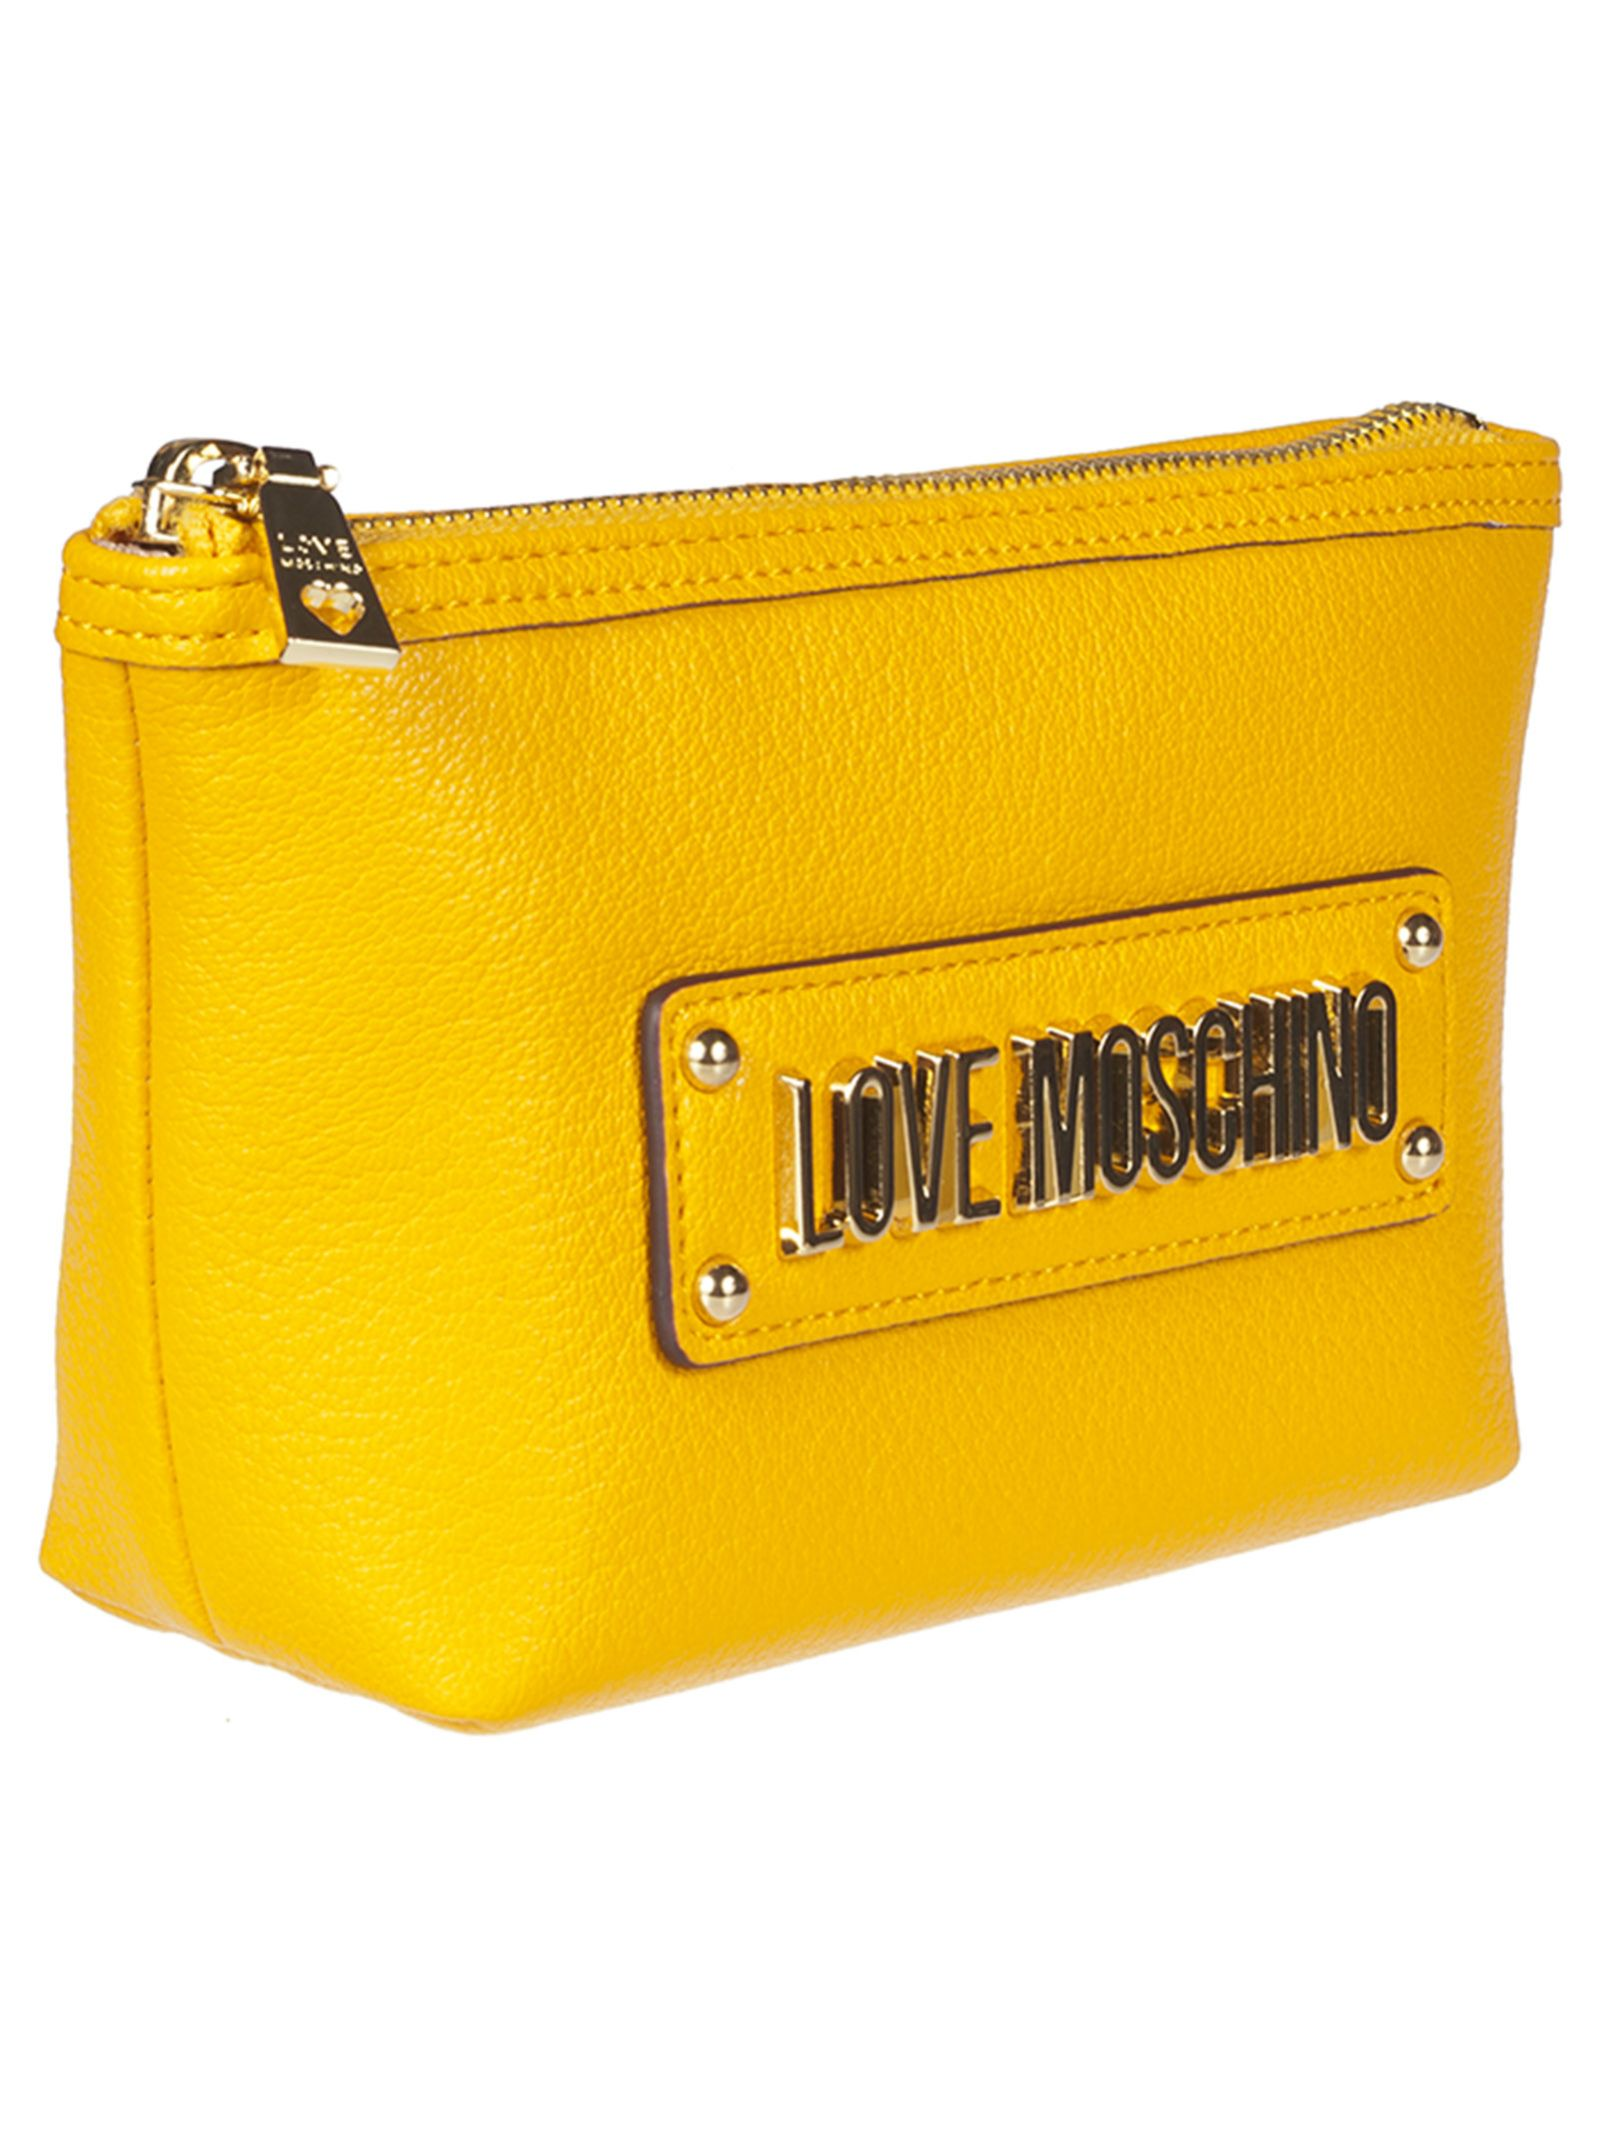 3eeebb46dc8 Love Moschino Love Moschino Logo Clutch - 10840723 | italist